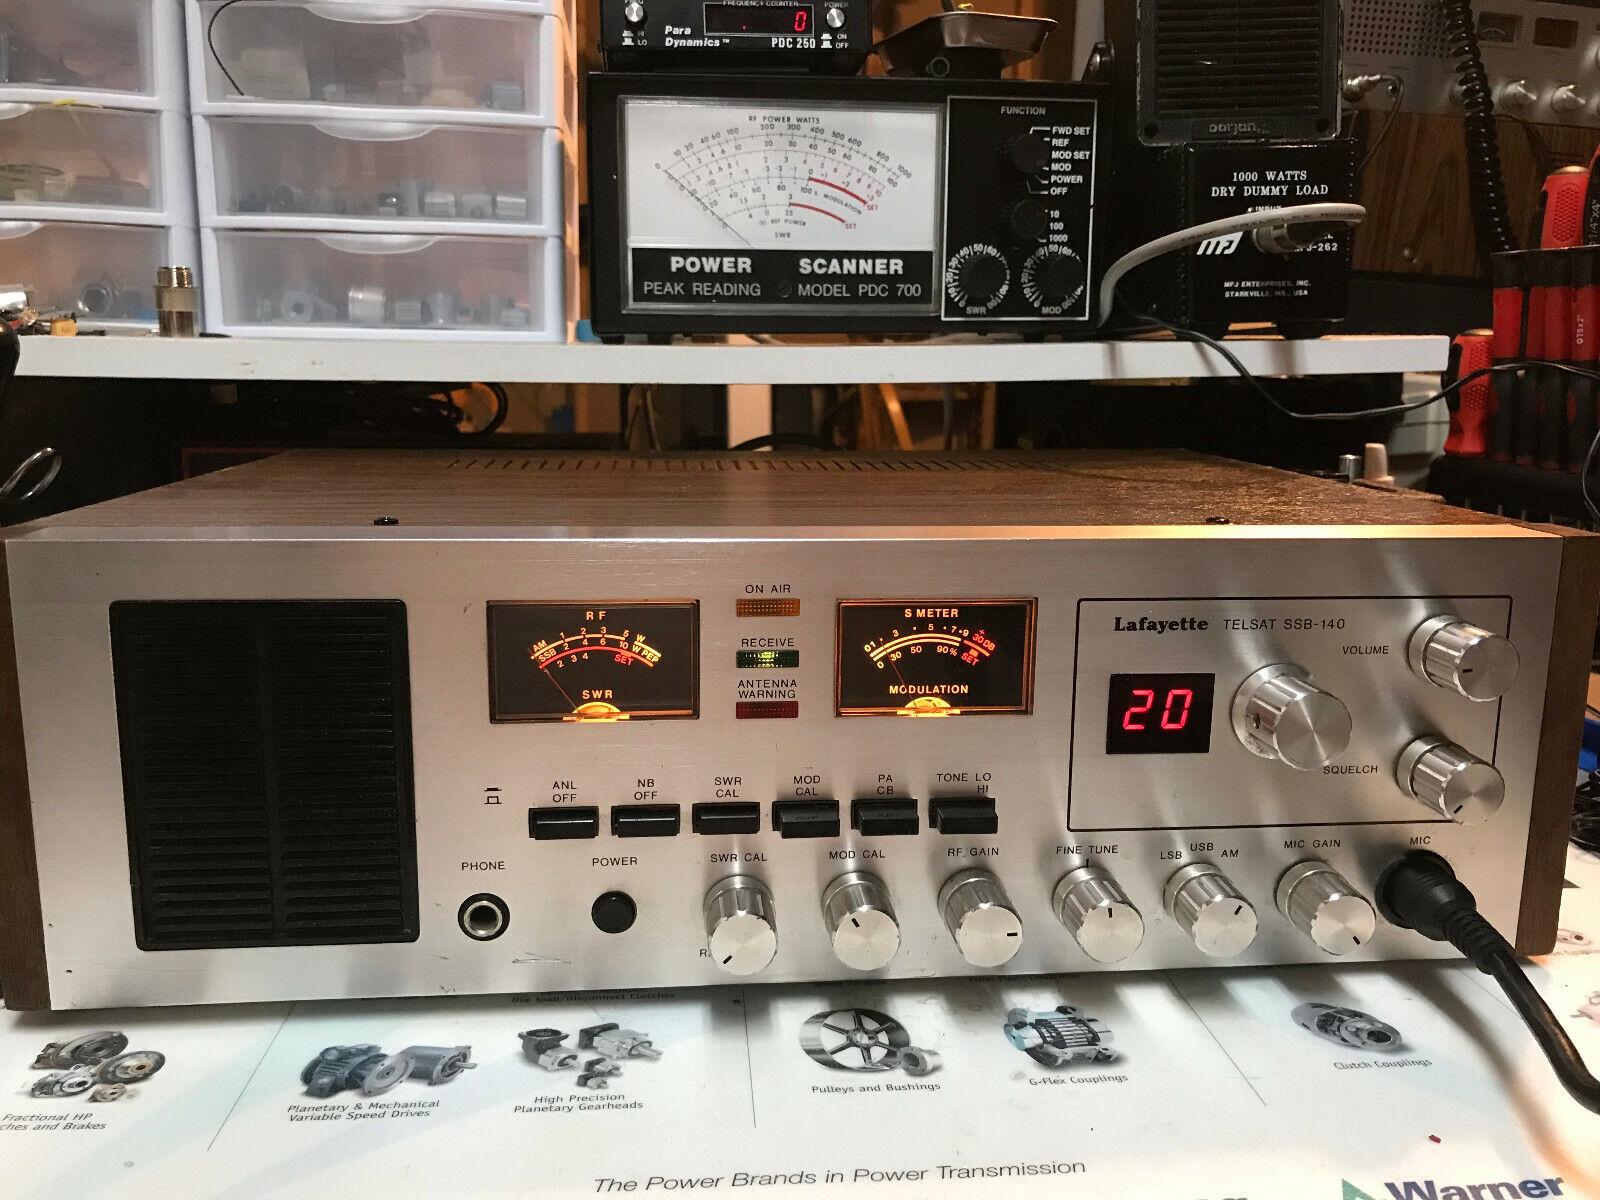 Lafayette TELSAT SSB-140 CB Radio. Buy it now for 250.00